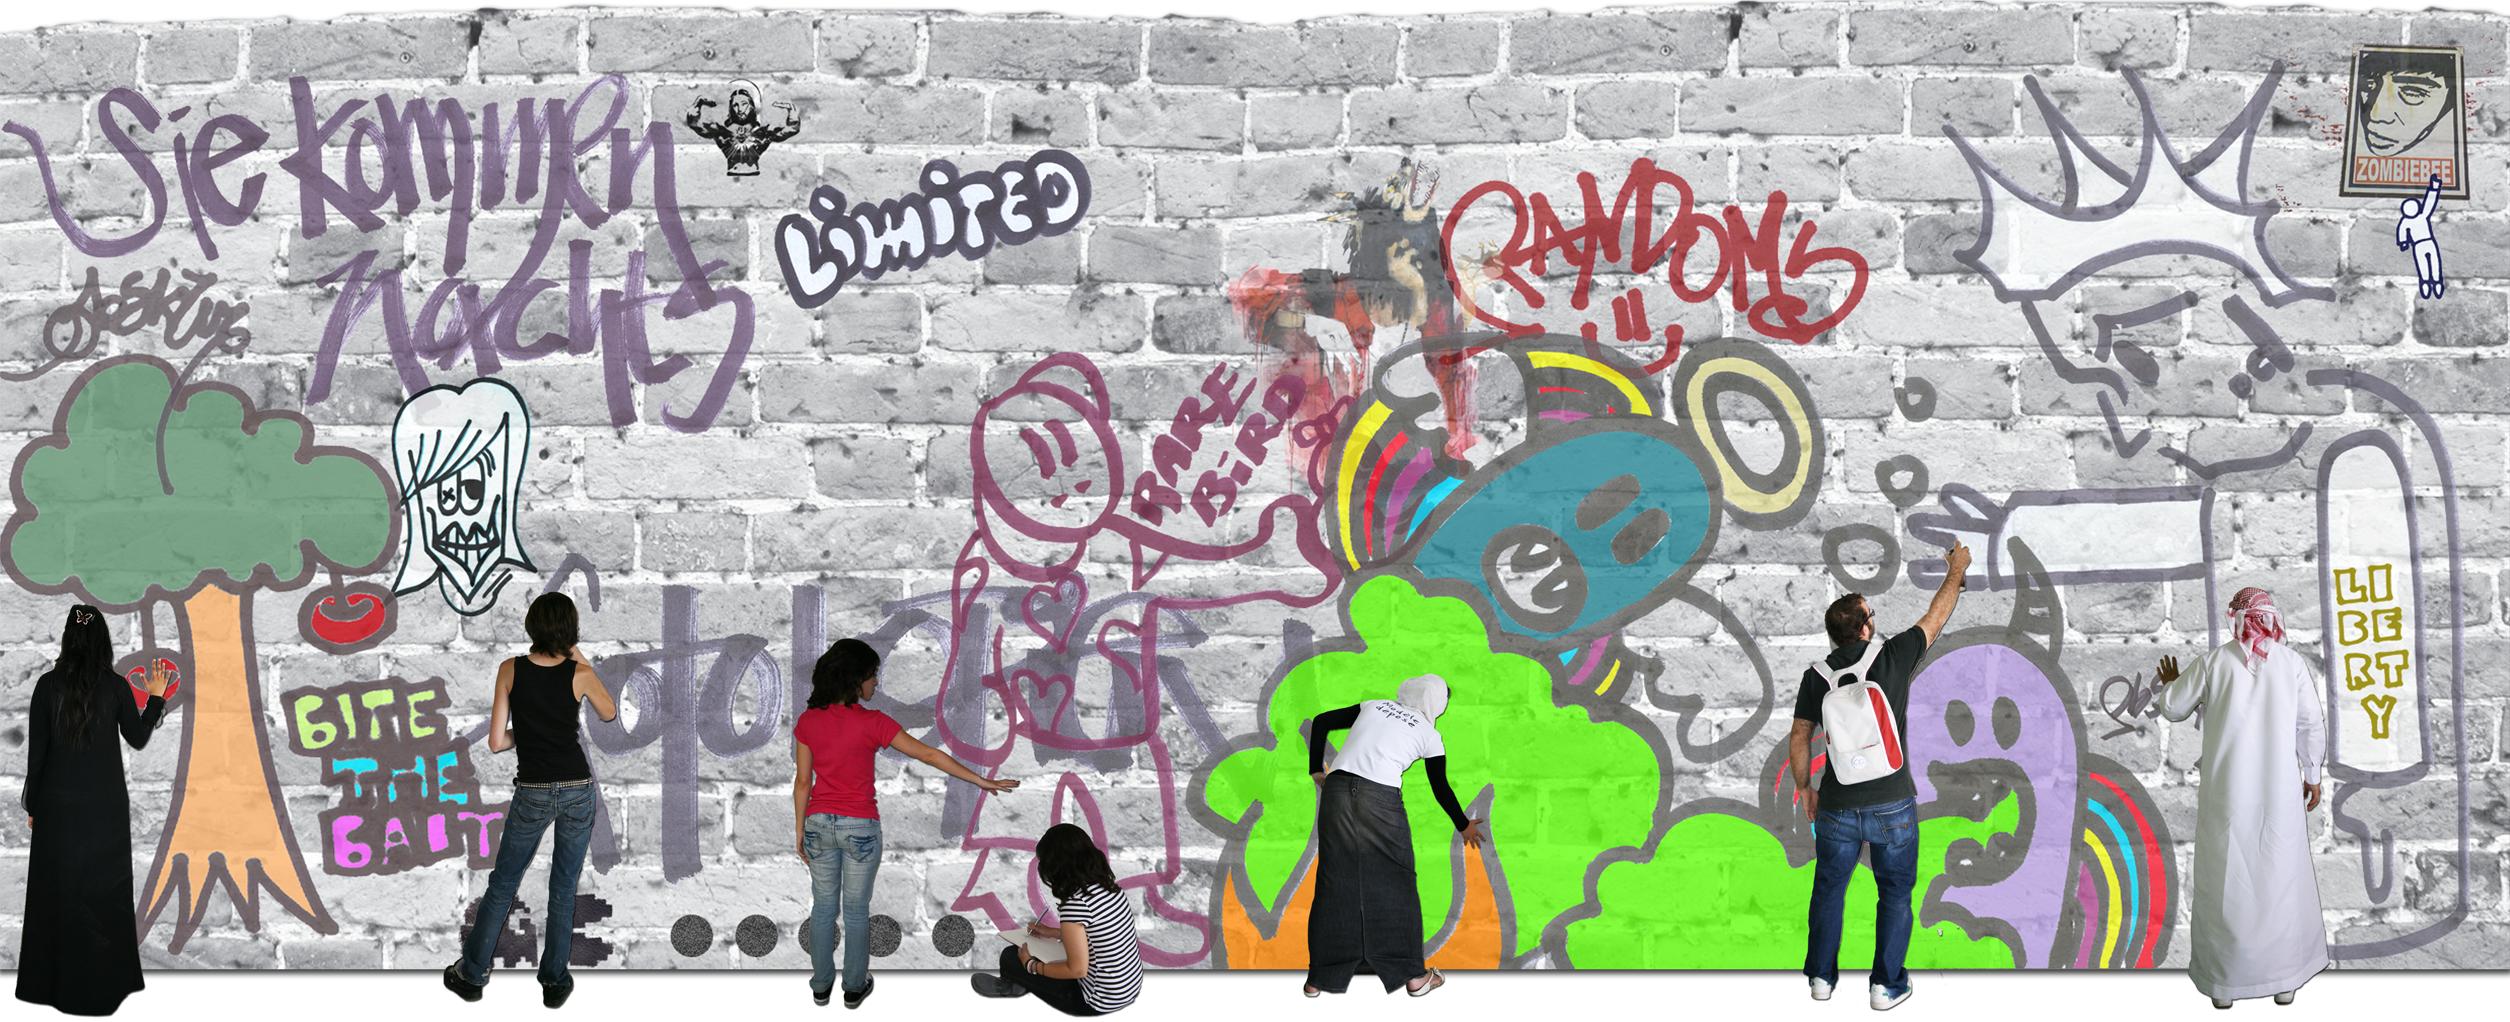 Berlin Wall. by obskuritee Berlin Wall. by obskuritee - Berlin Wall PNG